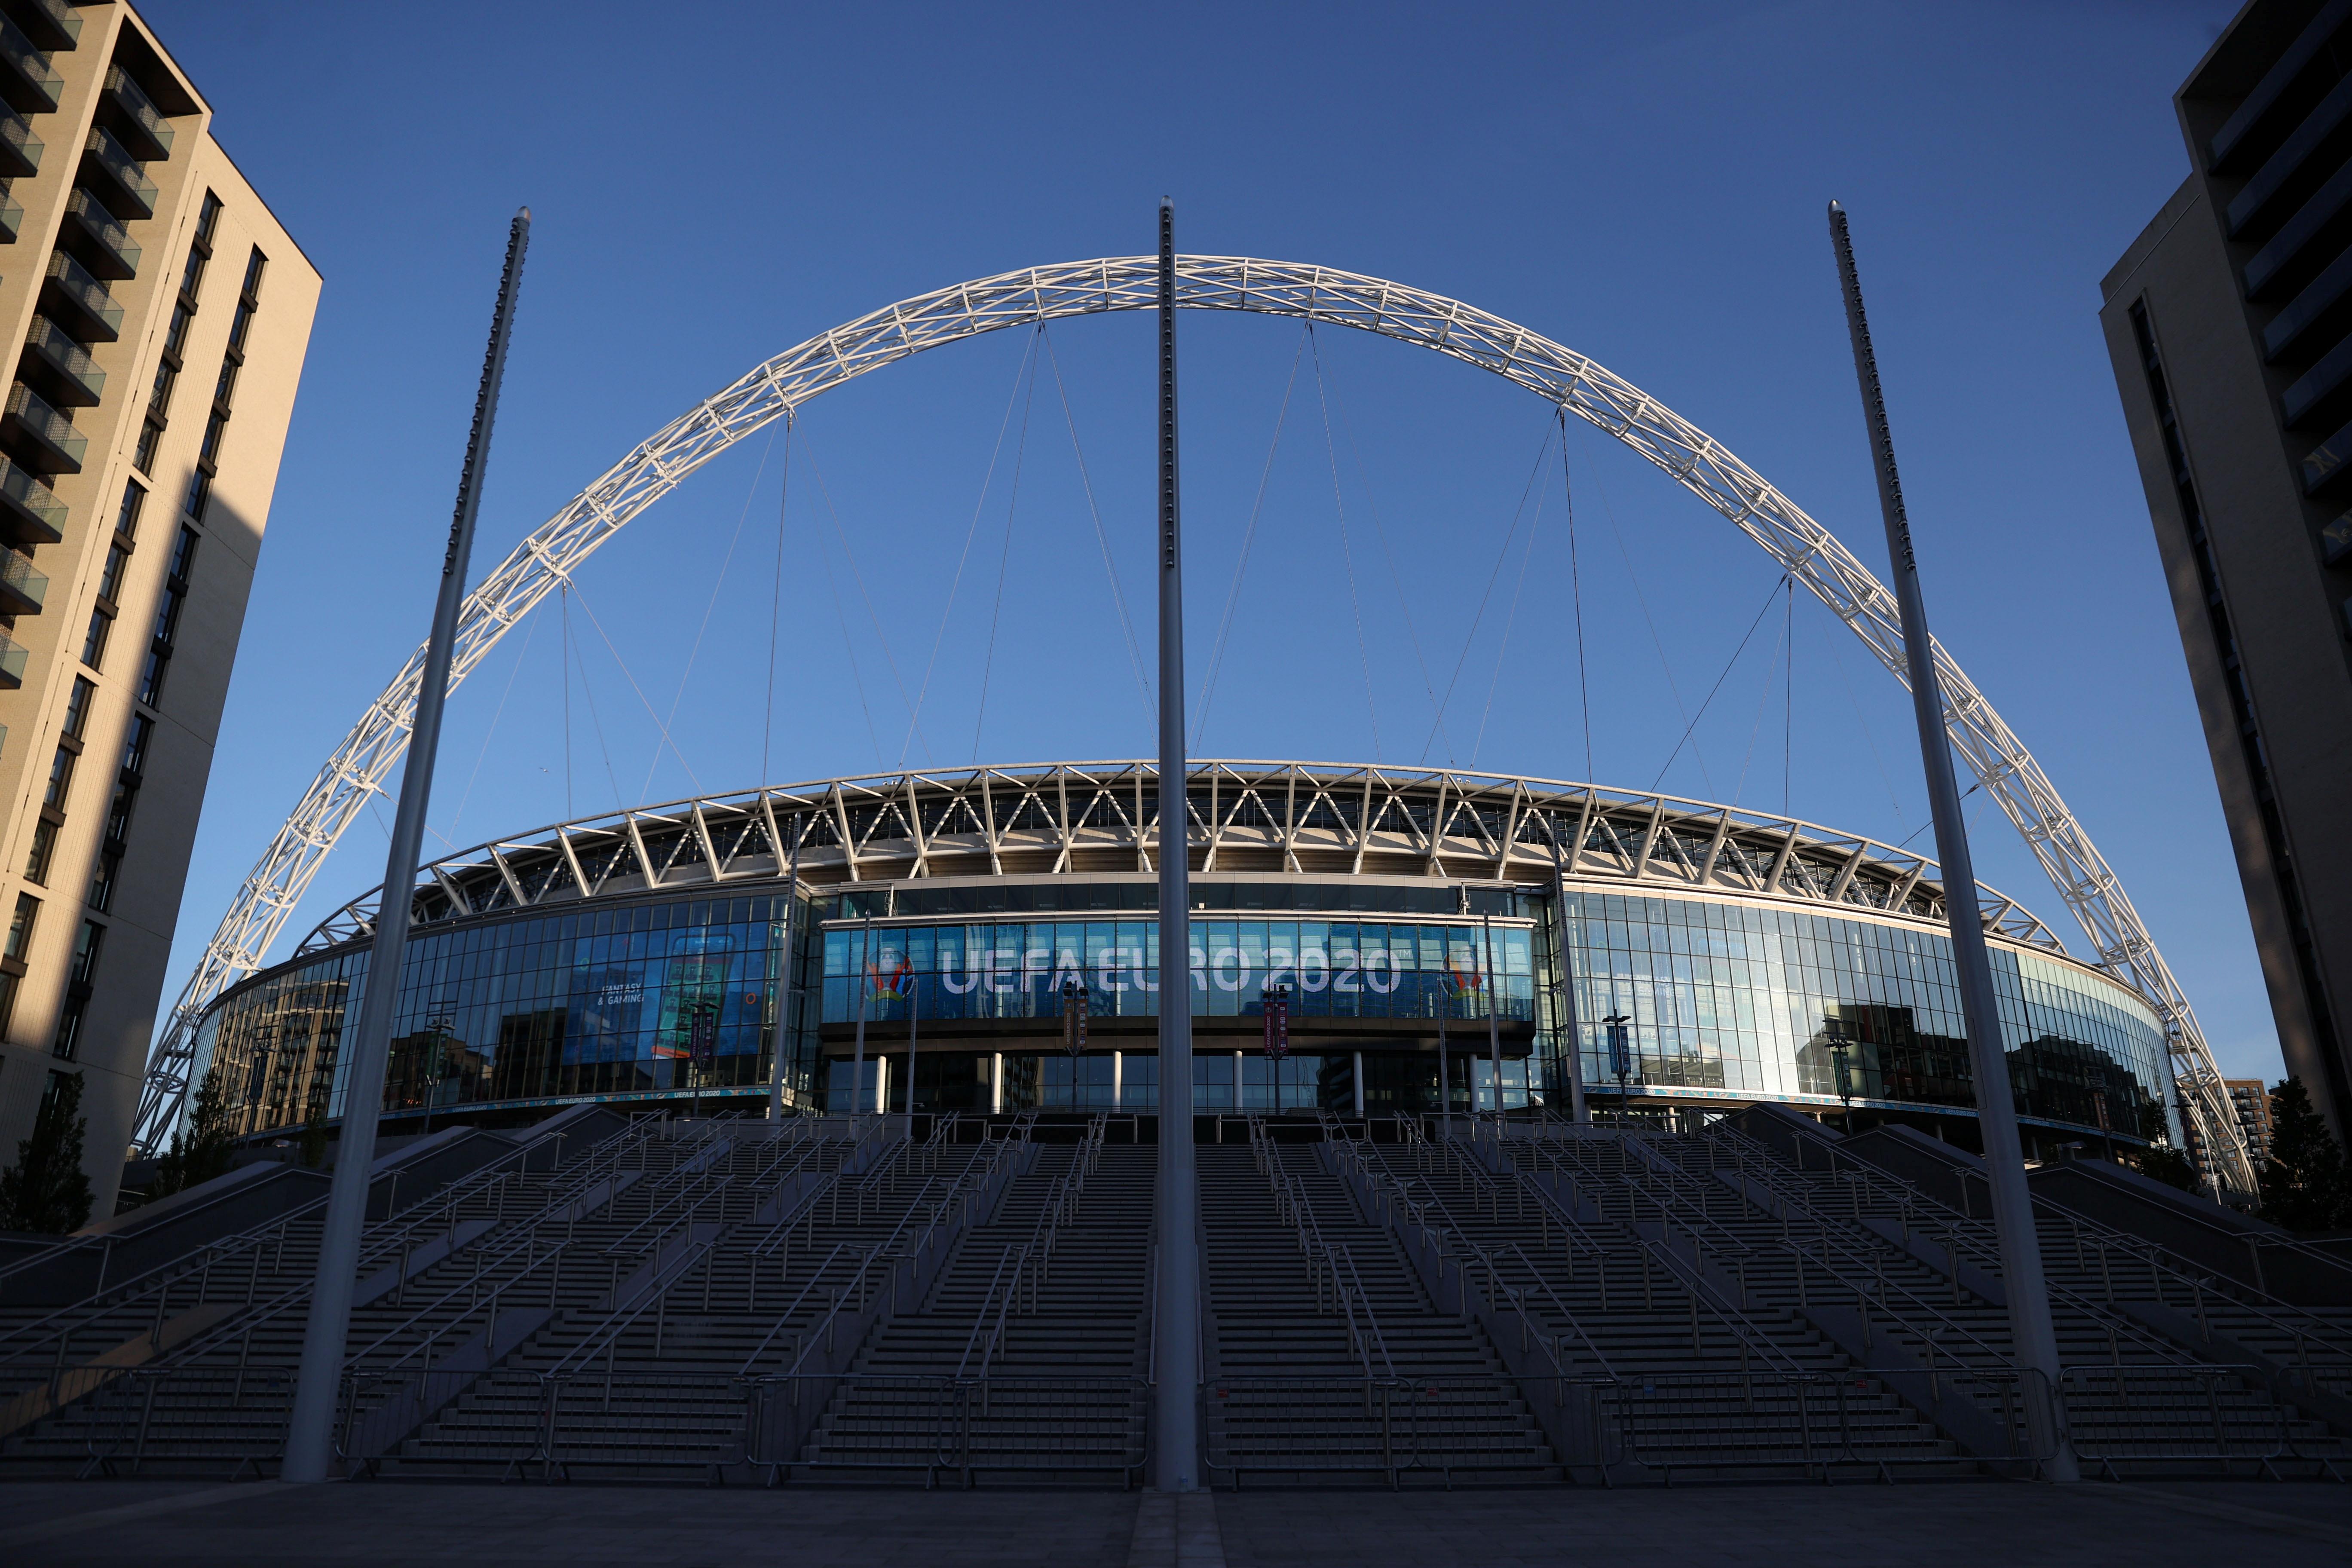 Soccer Football - Euro 2020 - Group D - General view of Wembley Stadium ahead of the England v Croatia match - Wembley Stadium, London, Britain - June 12, 2021 REUTERS/Carl Recine/File Photo